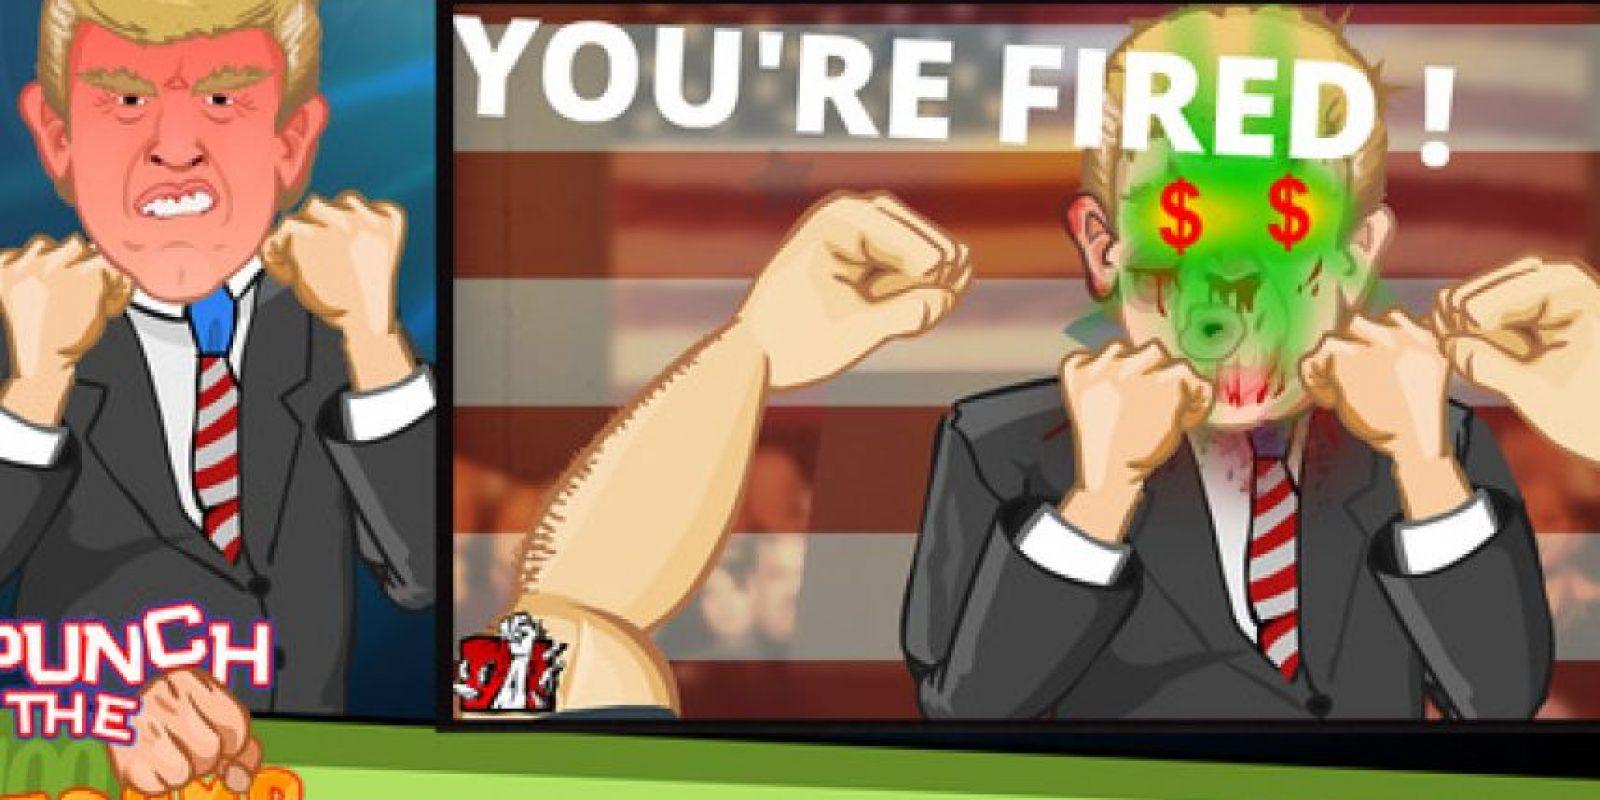 Punch The Trump – Presidential Brawl Foto:Brutal Inc